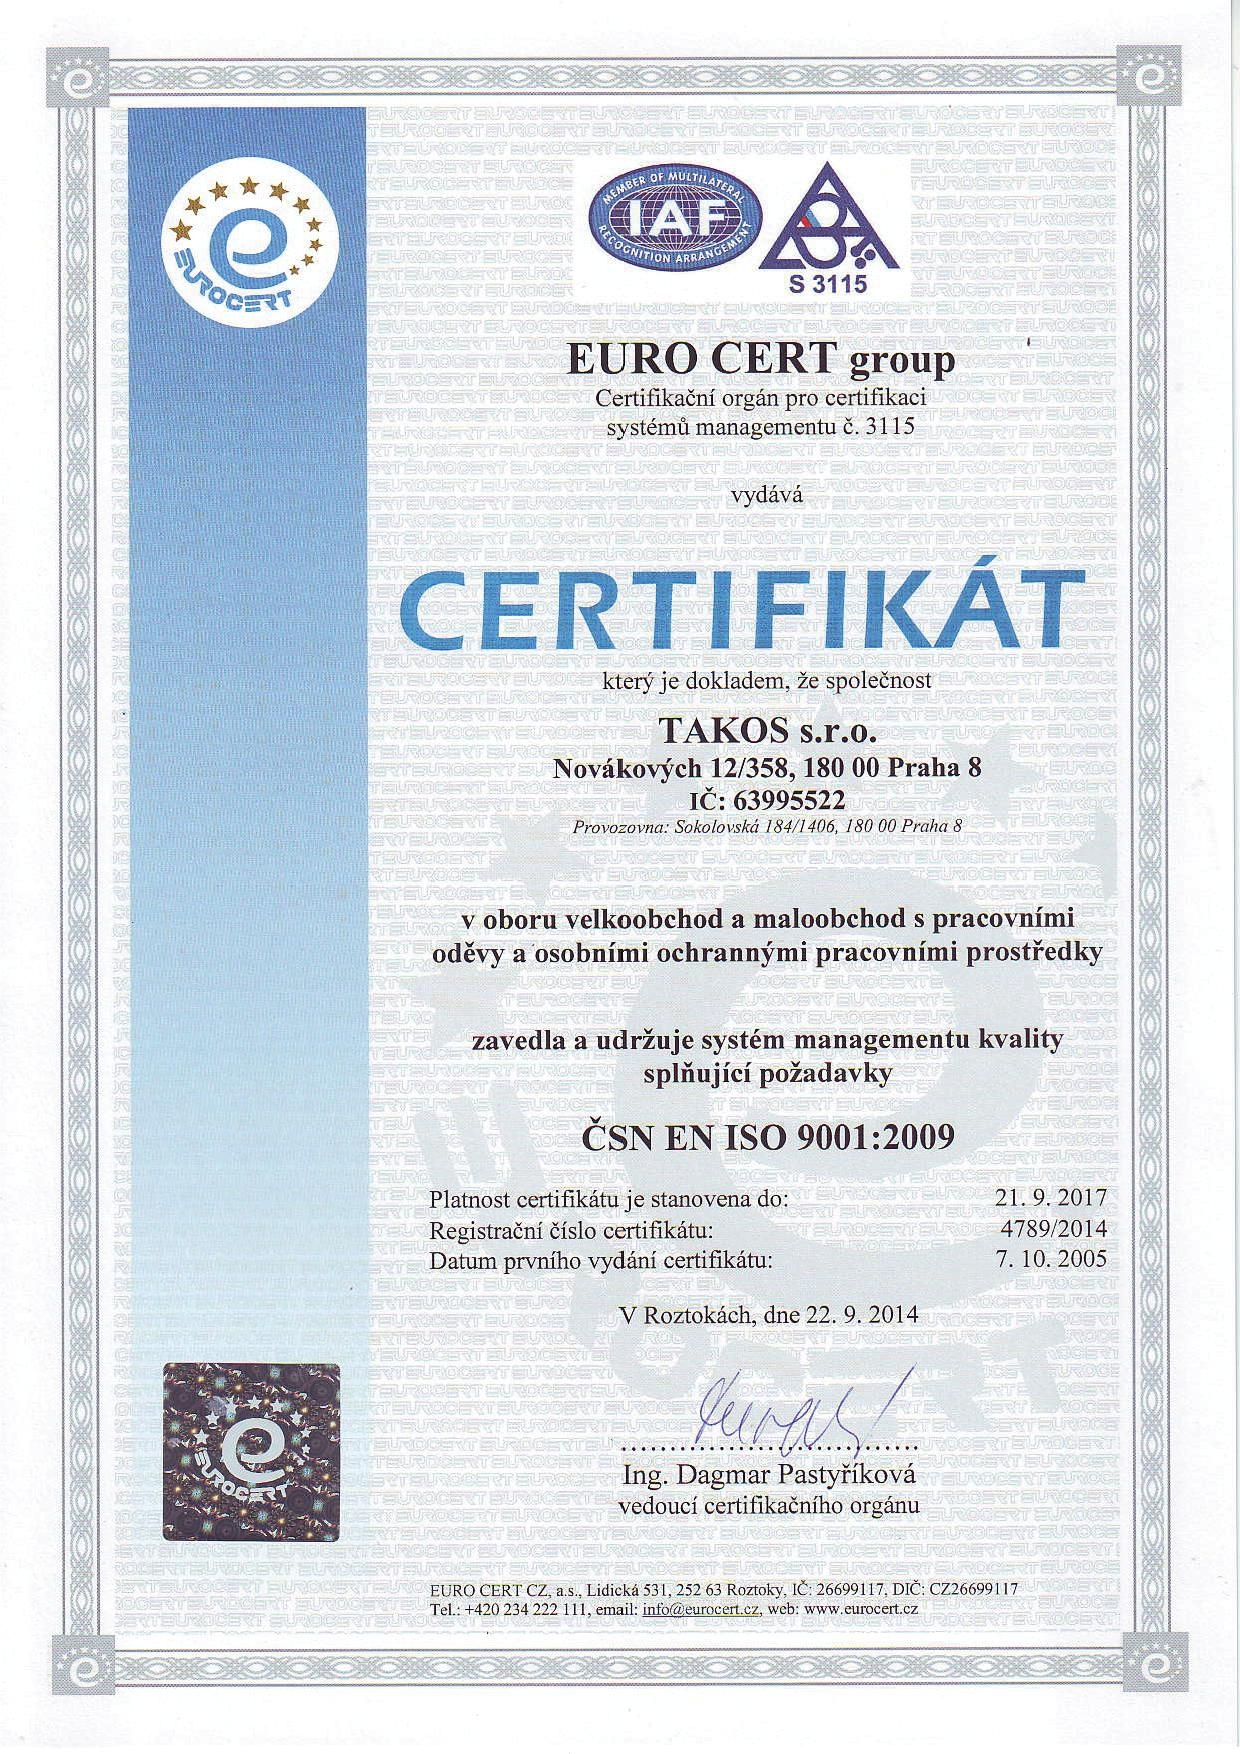 TAKOS - Certifikat ČSN EN ISO 9001:2009